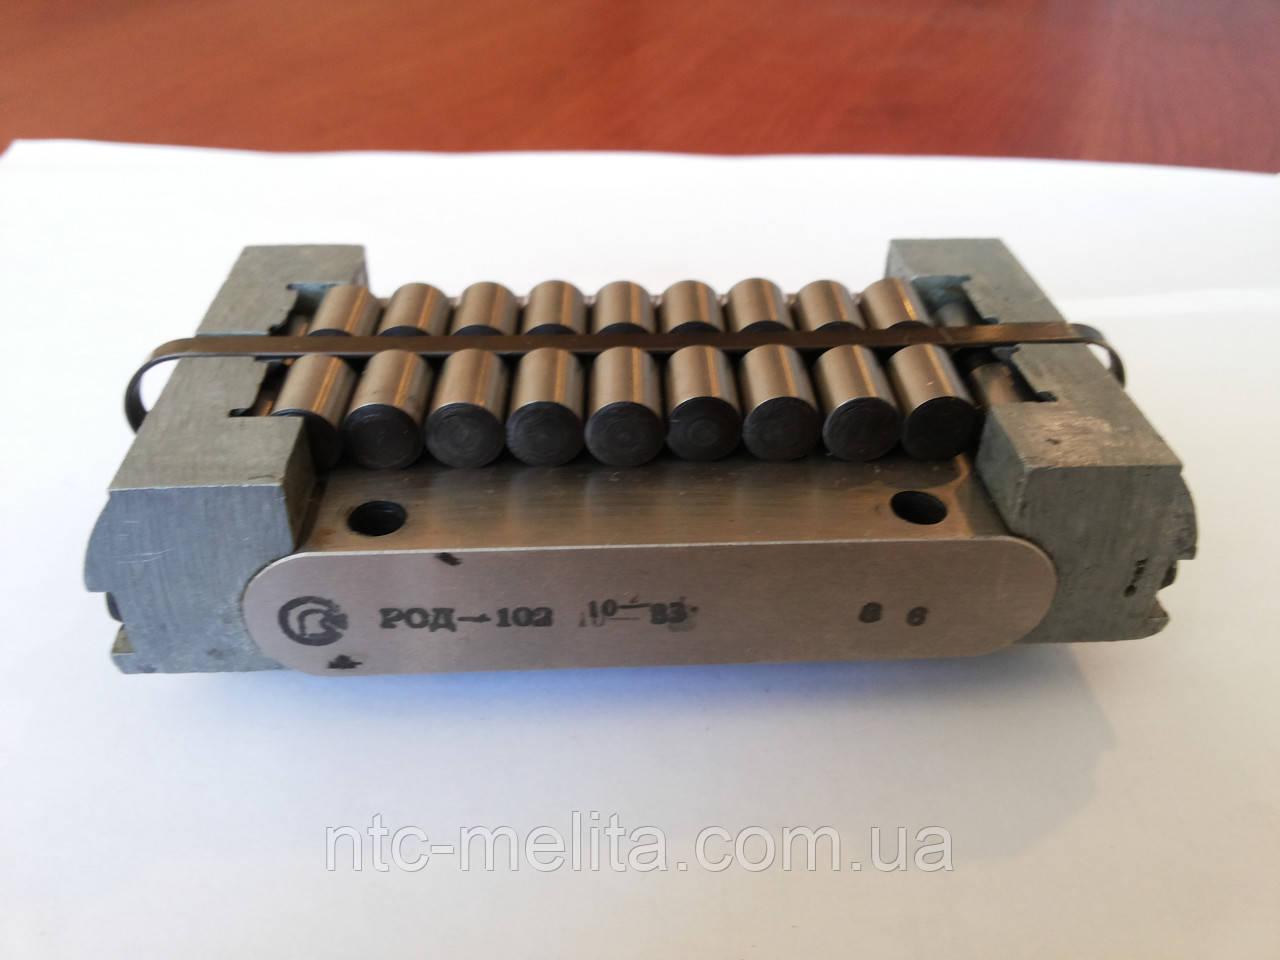 Роликовая опора РОД-102